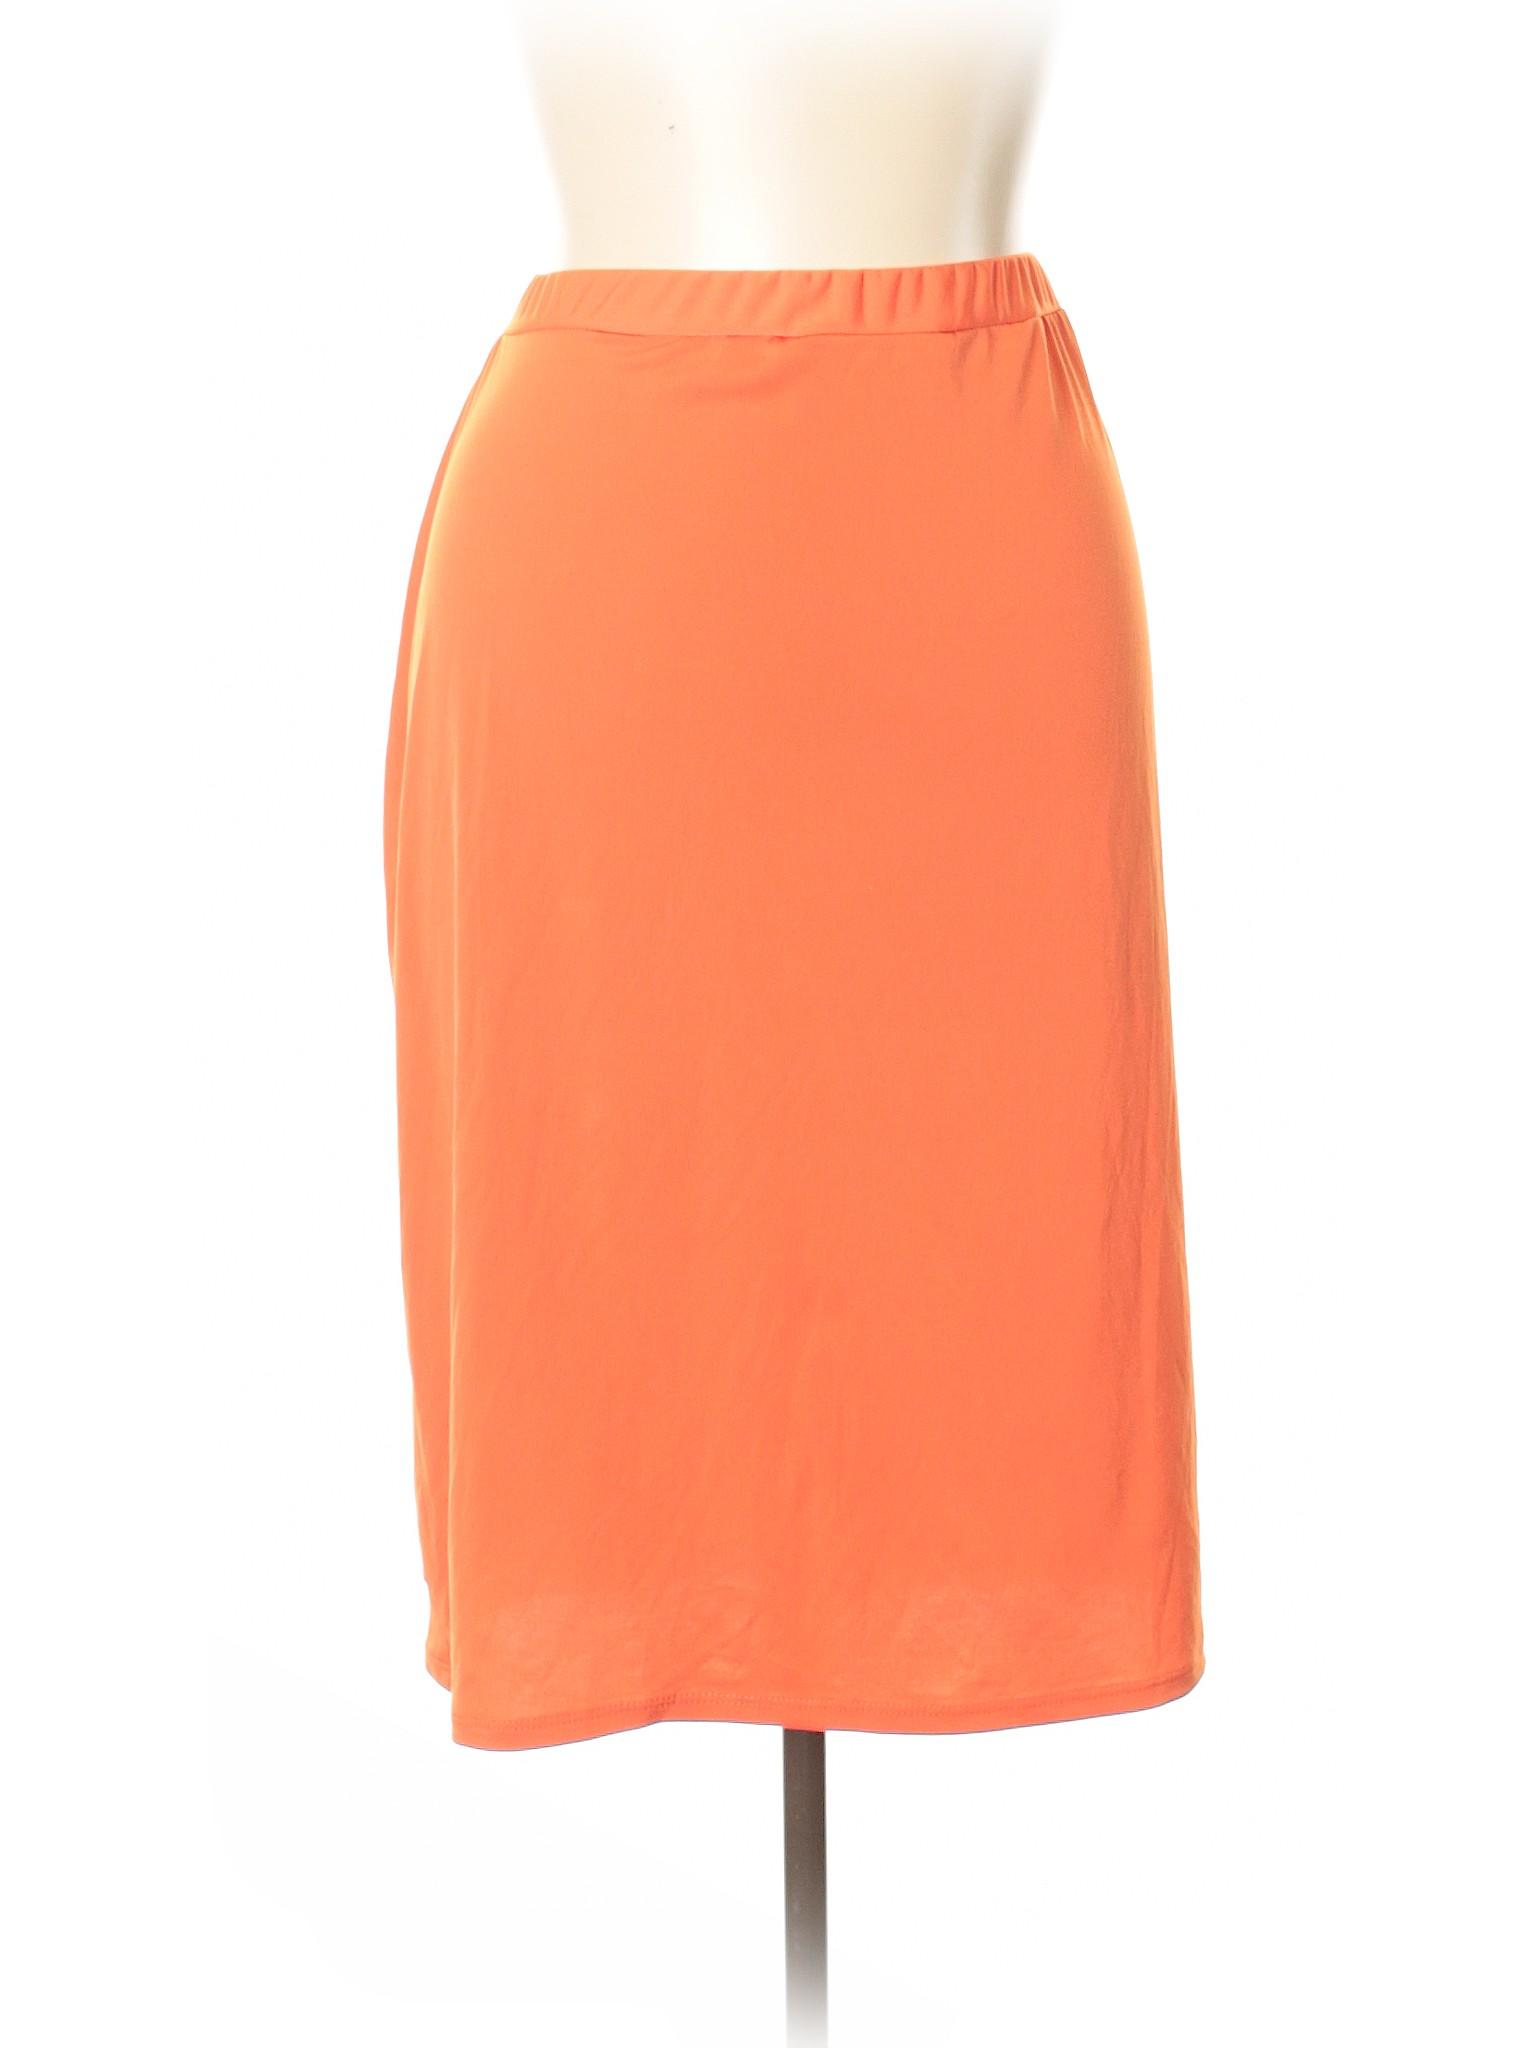 Skirt Skirt Metrostyle Metrostyle Metrostyle Casual Casual Boutique Boutique Boutique naI8Iqw